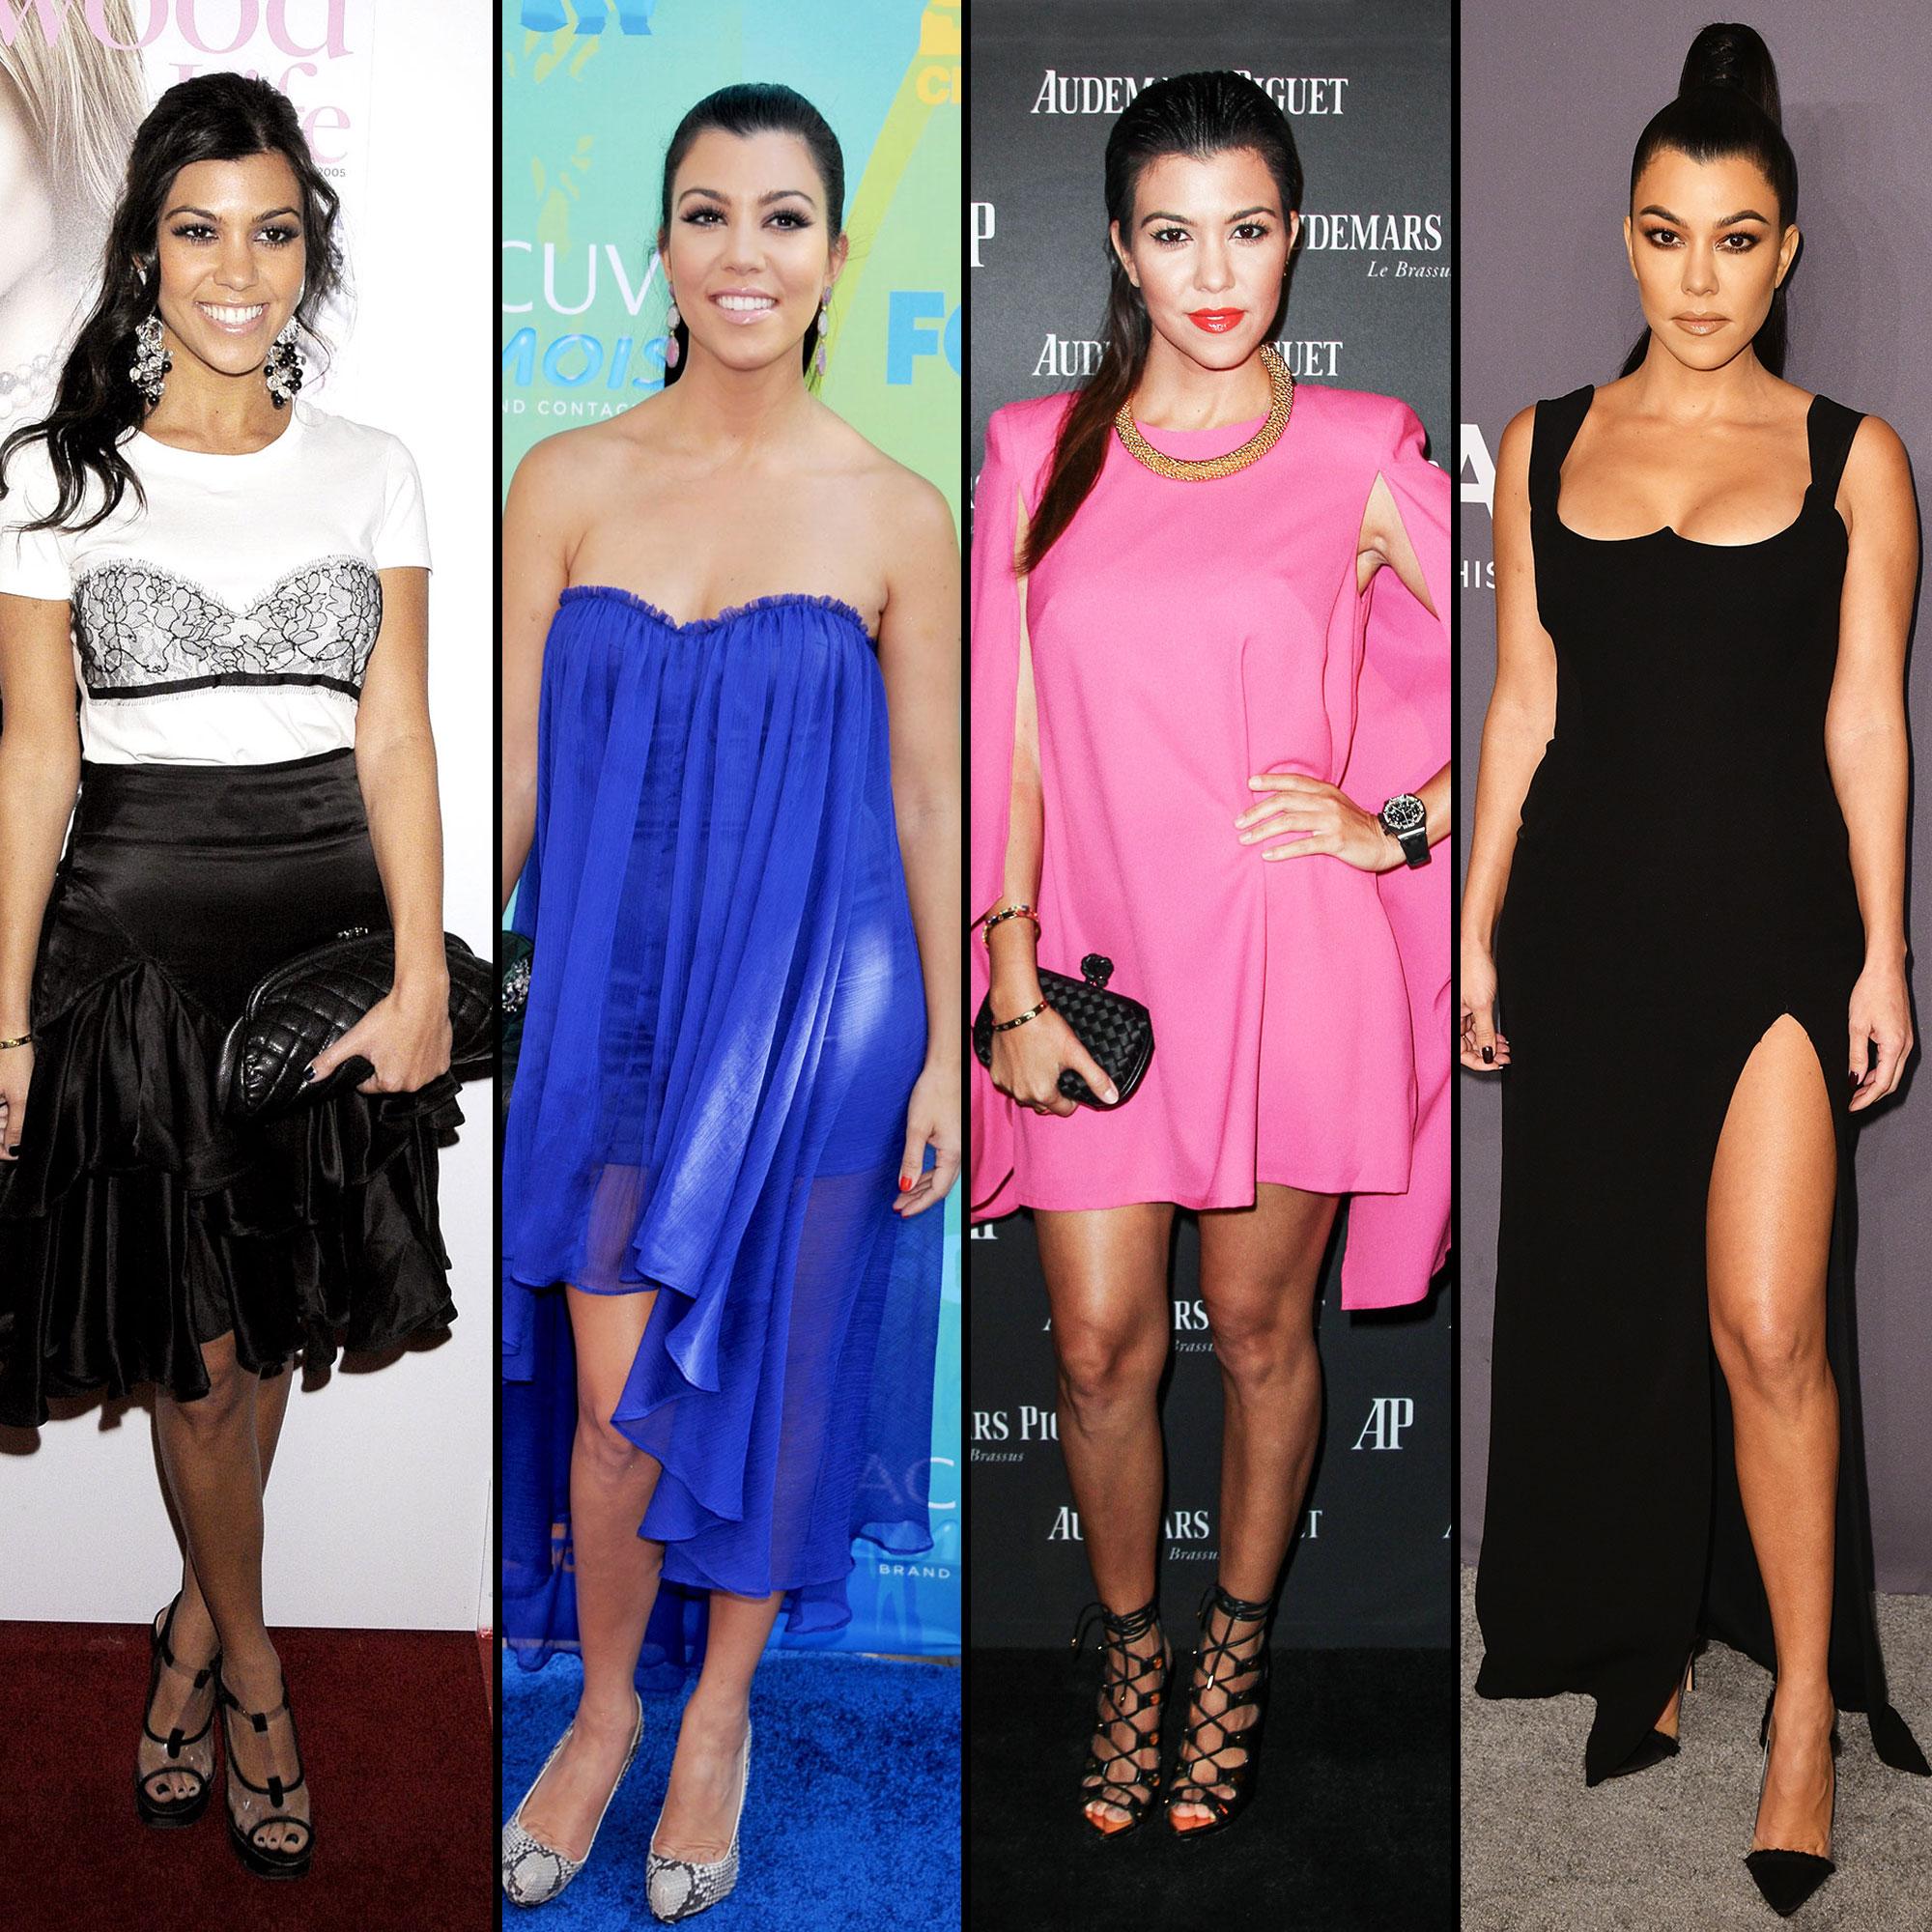 Happy 40th Birthday, Kourtney Kardashian - Kourtney Kardashian